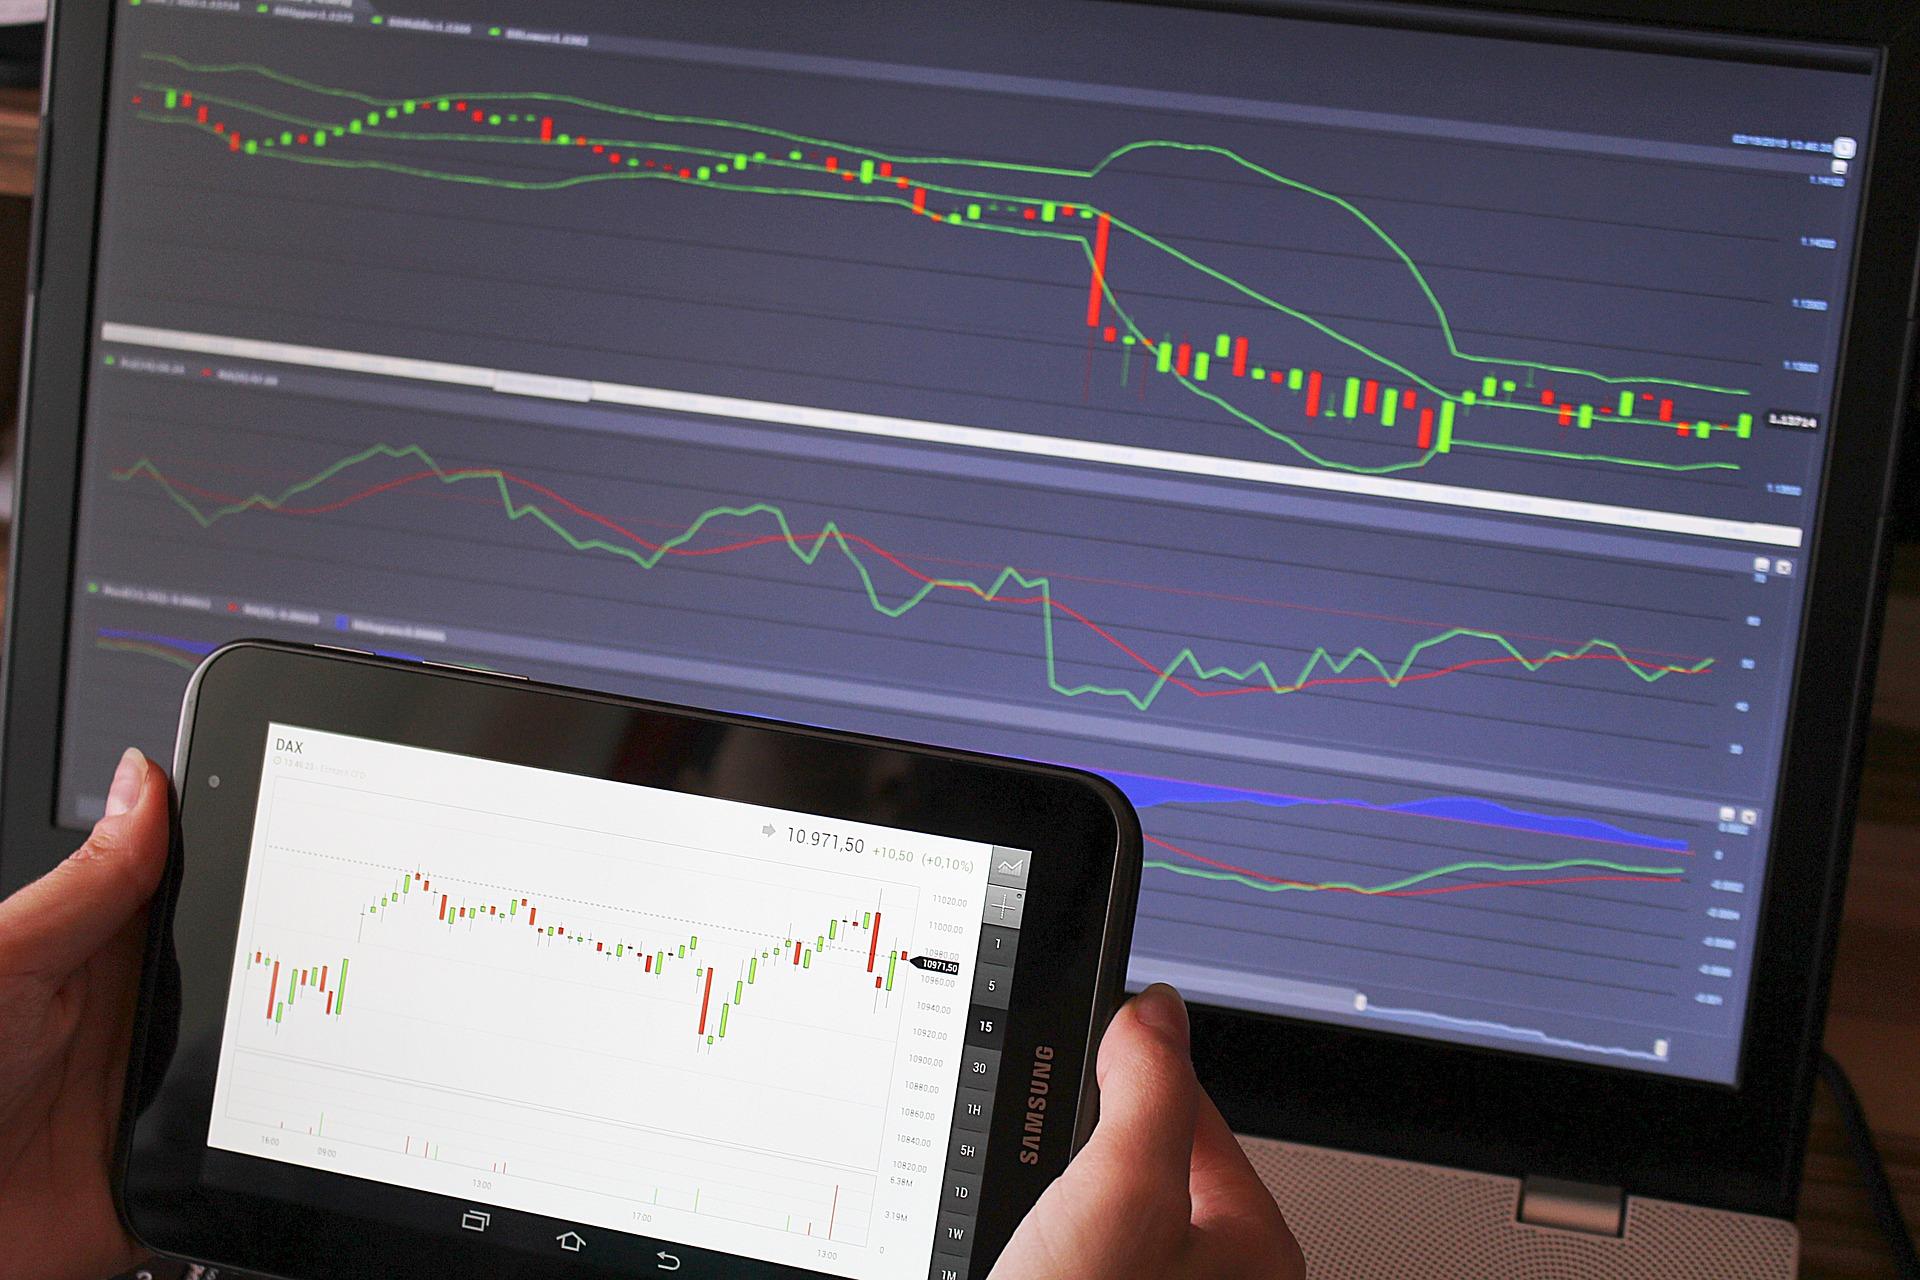 Investir Na Bolsa: Que Tipo De Ordem Utilizar